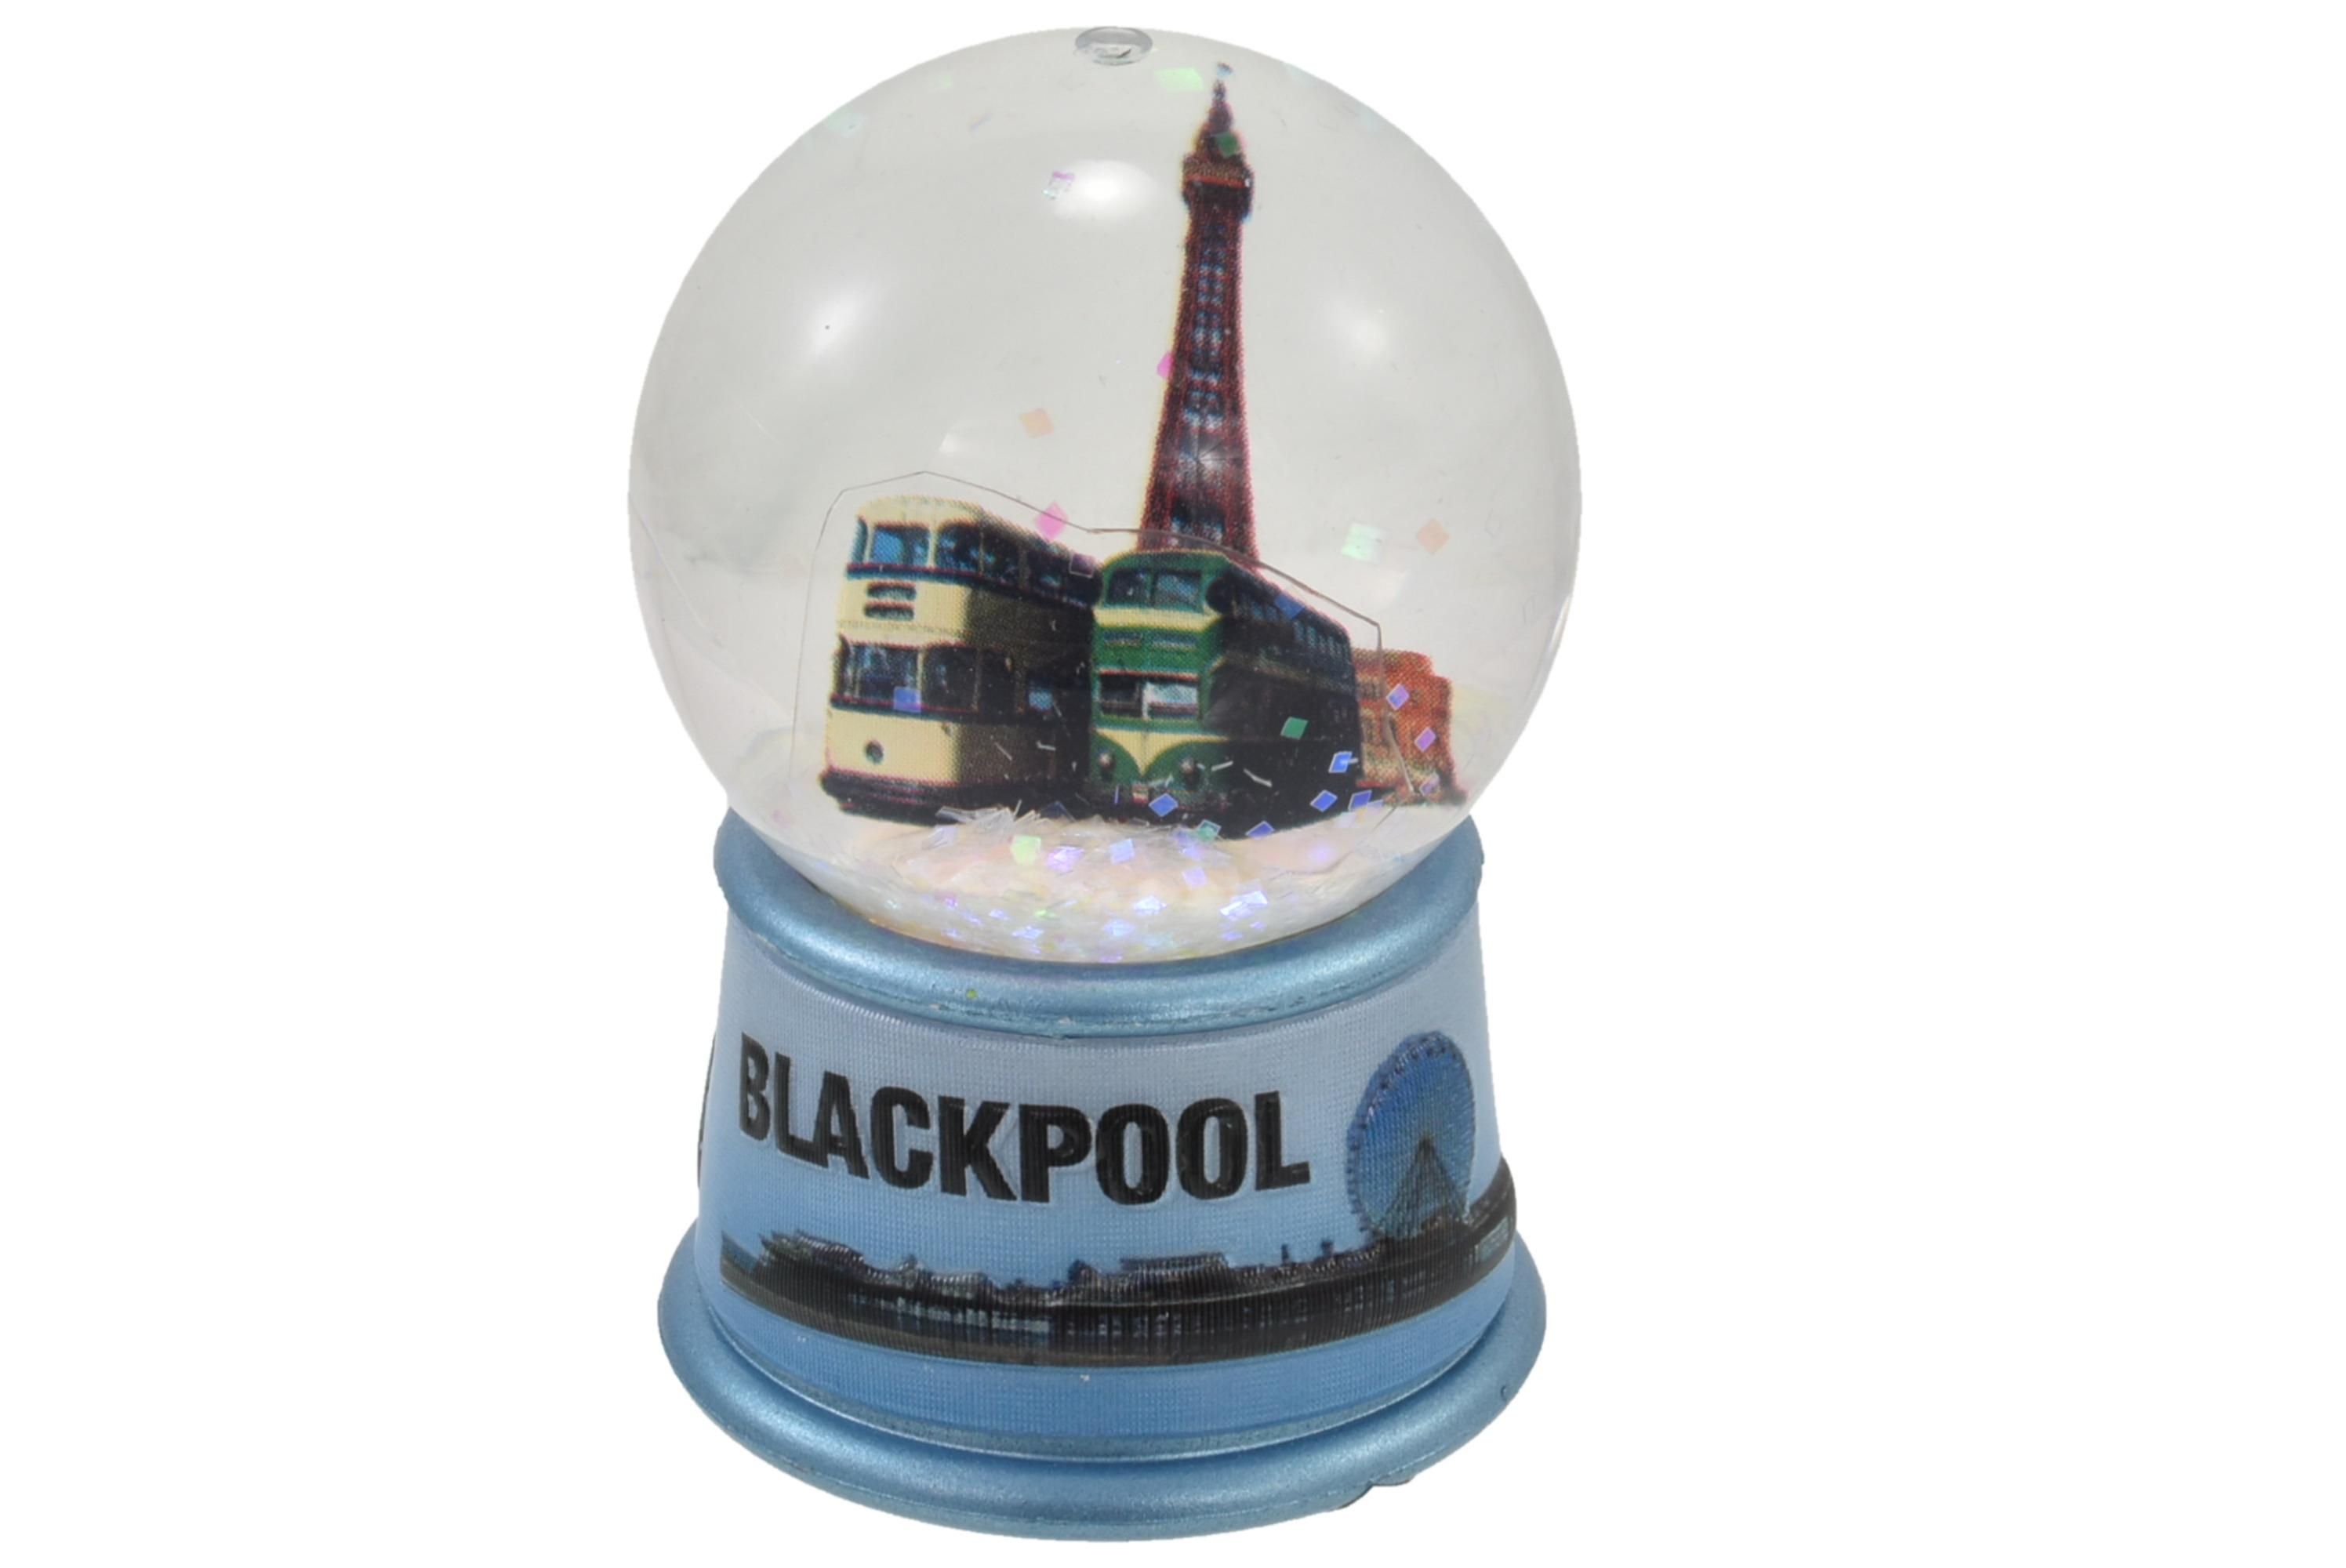 45mm Blackpool Waterball Pvc 3d Wrap